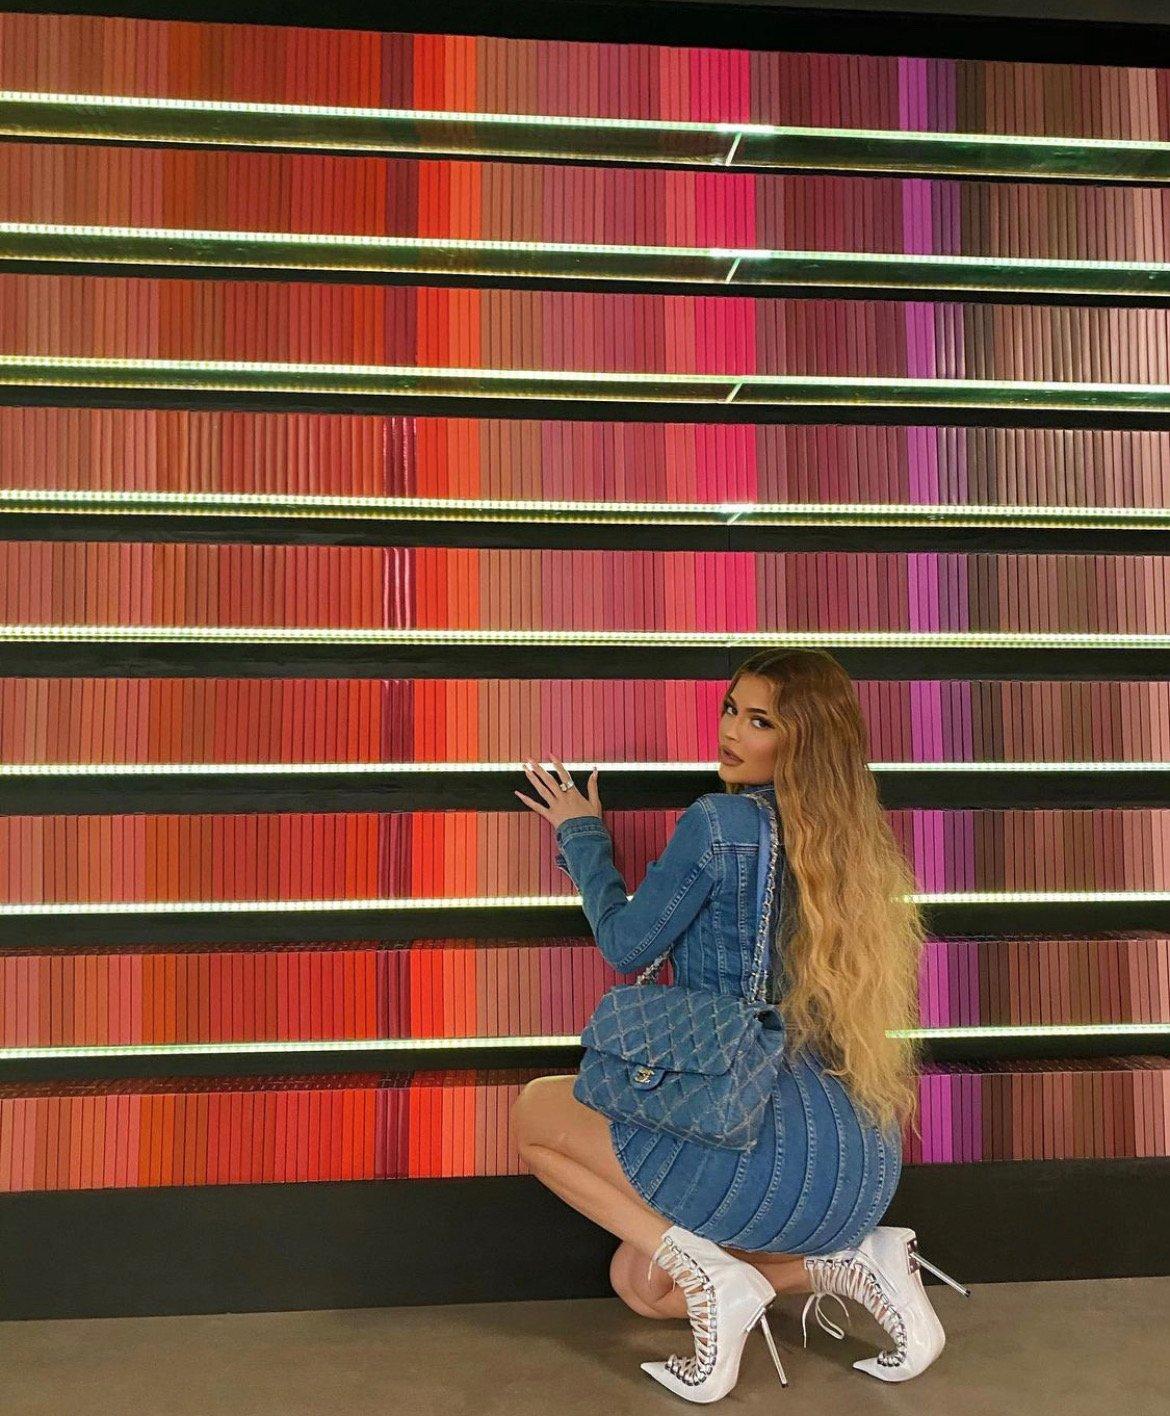 Kylie Jenner Lip Kit Wall